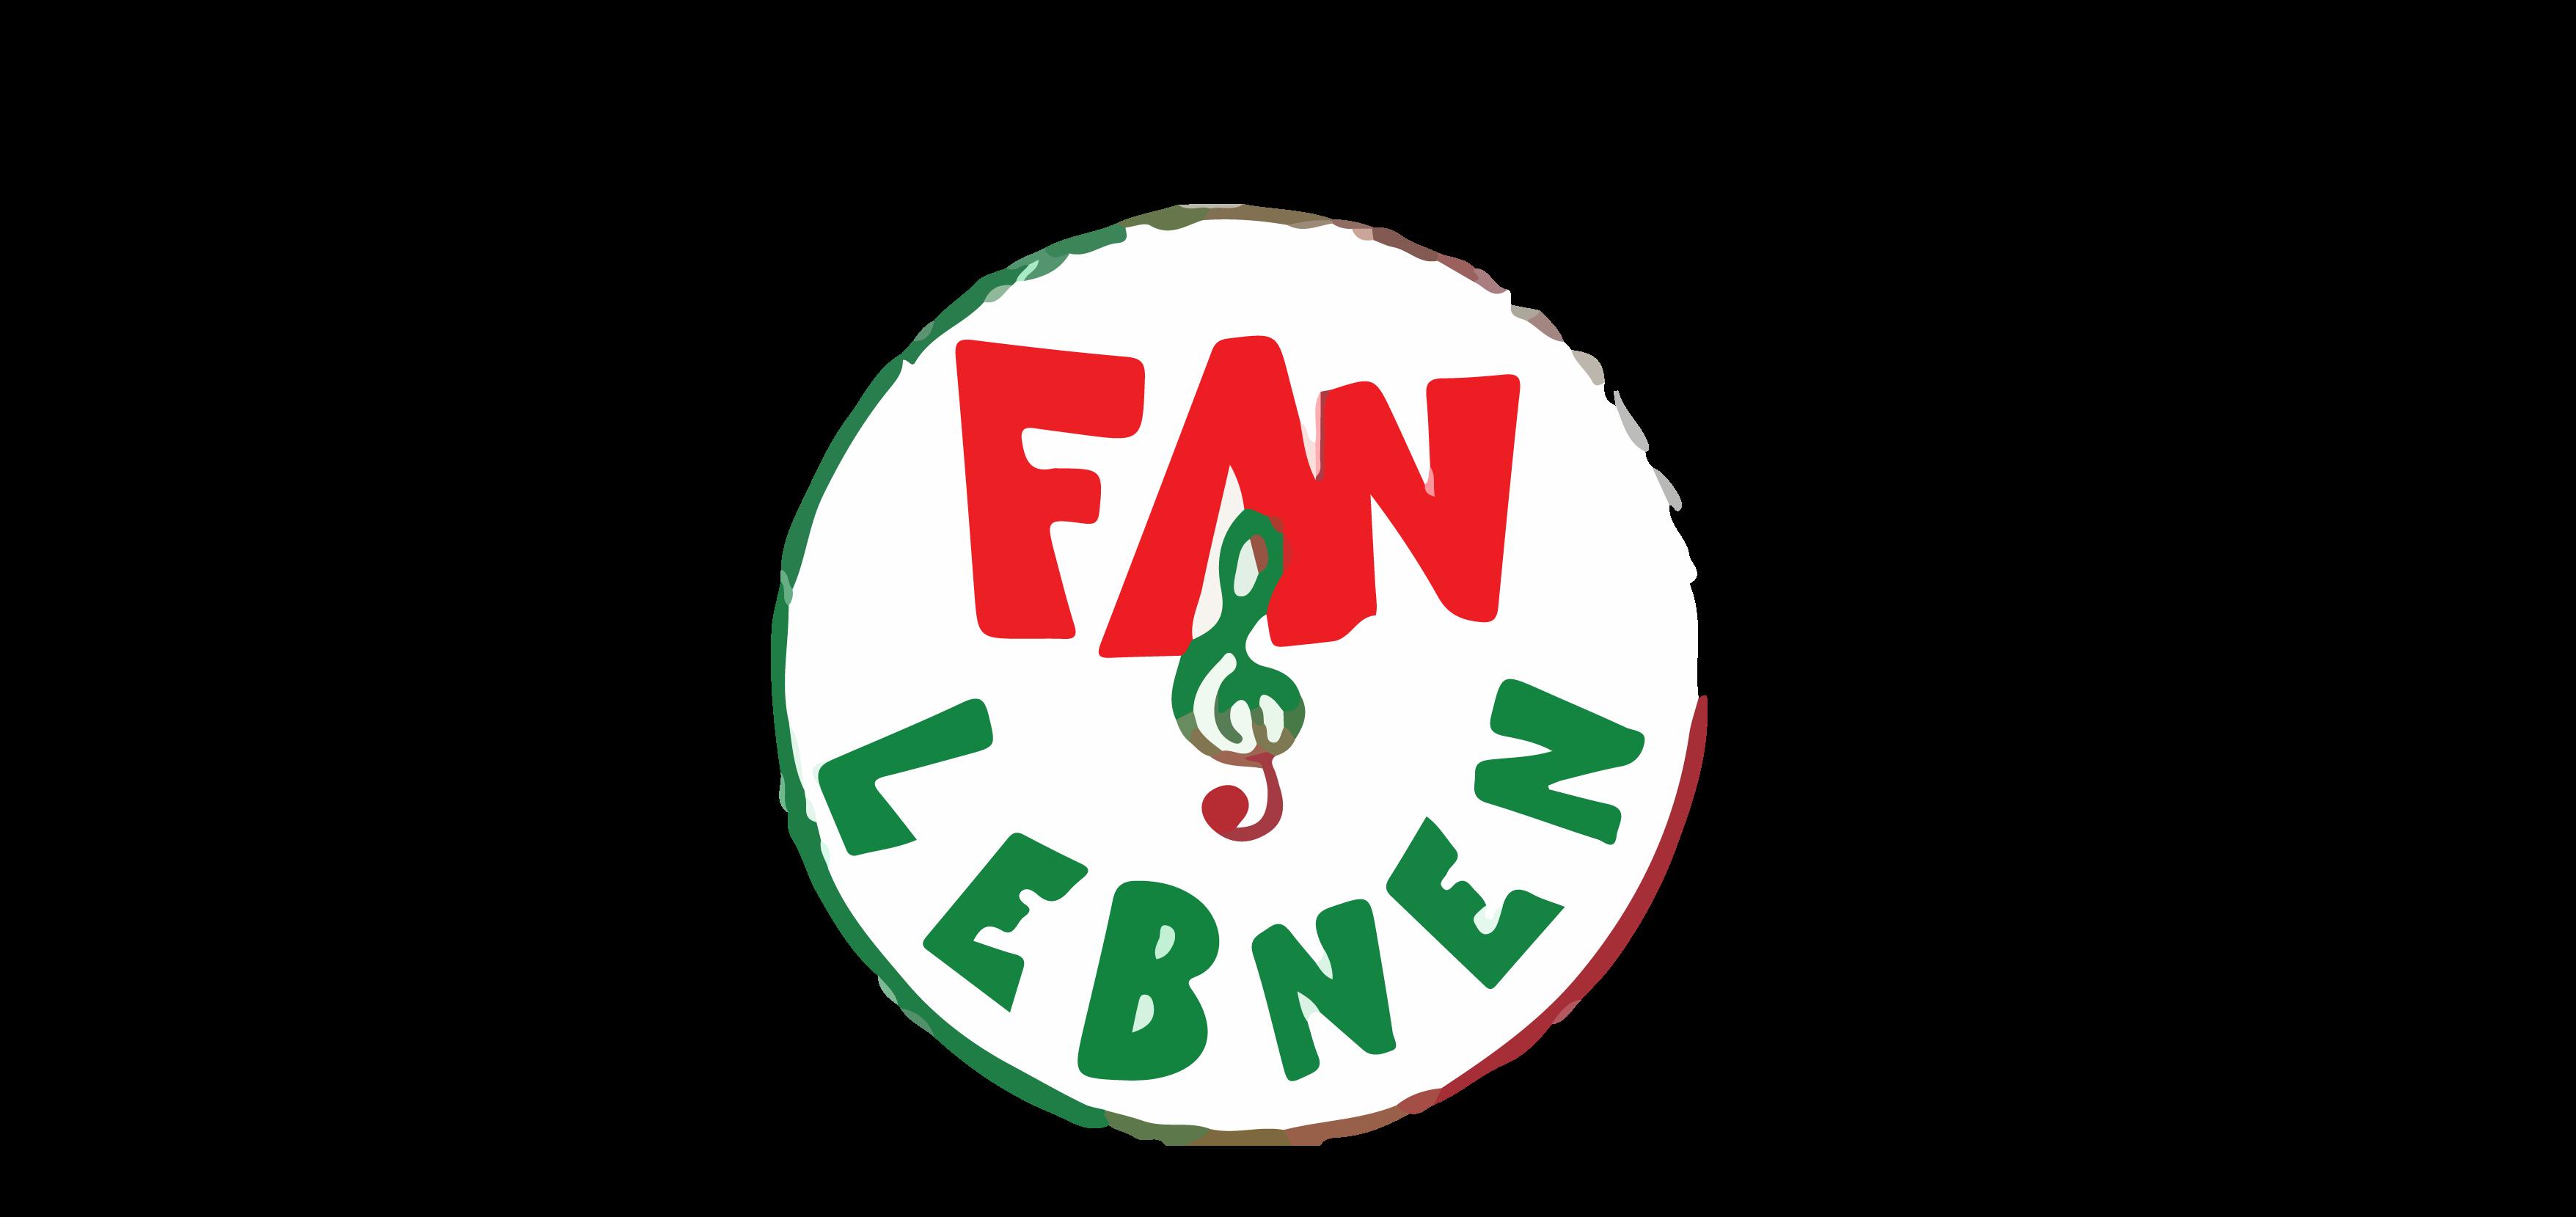 fanlebnen.com